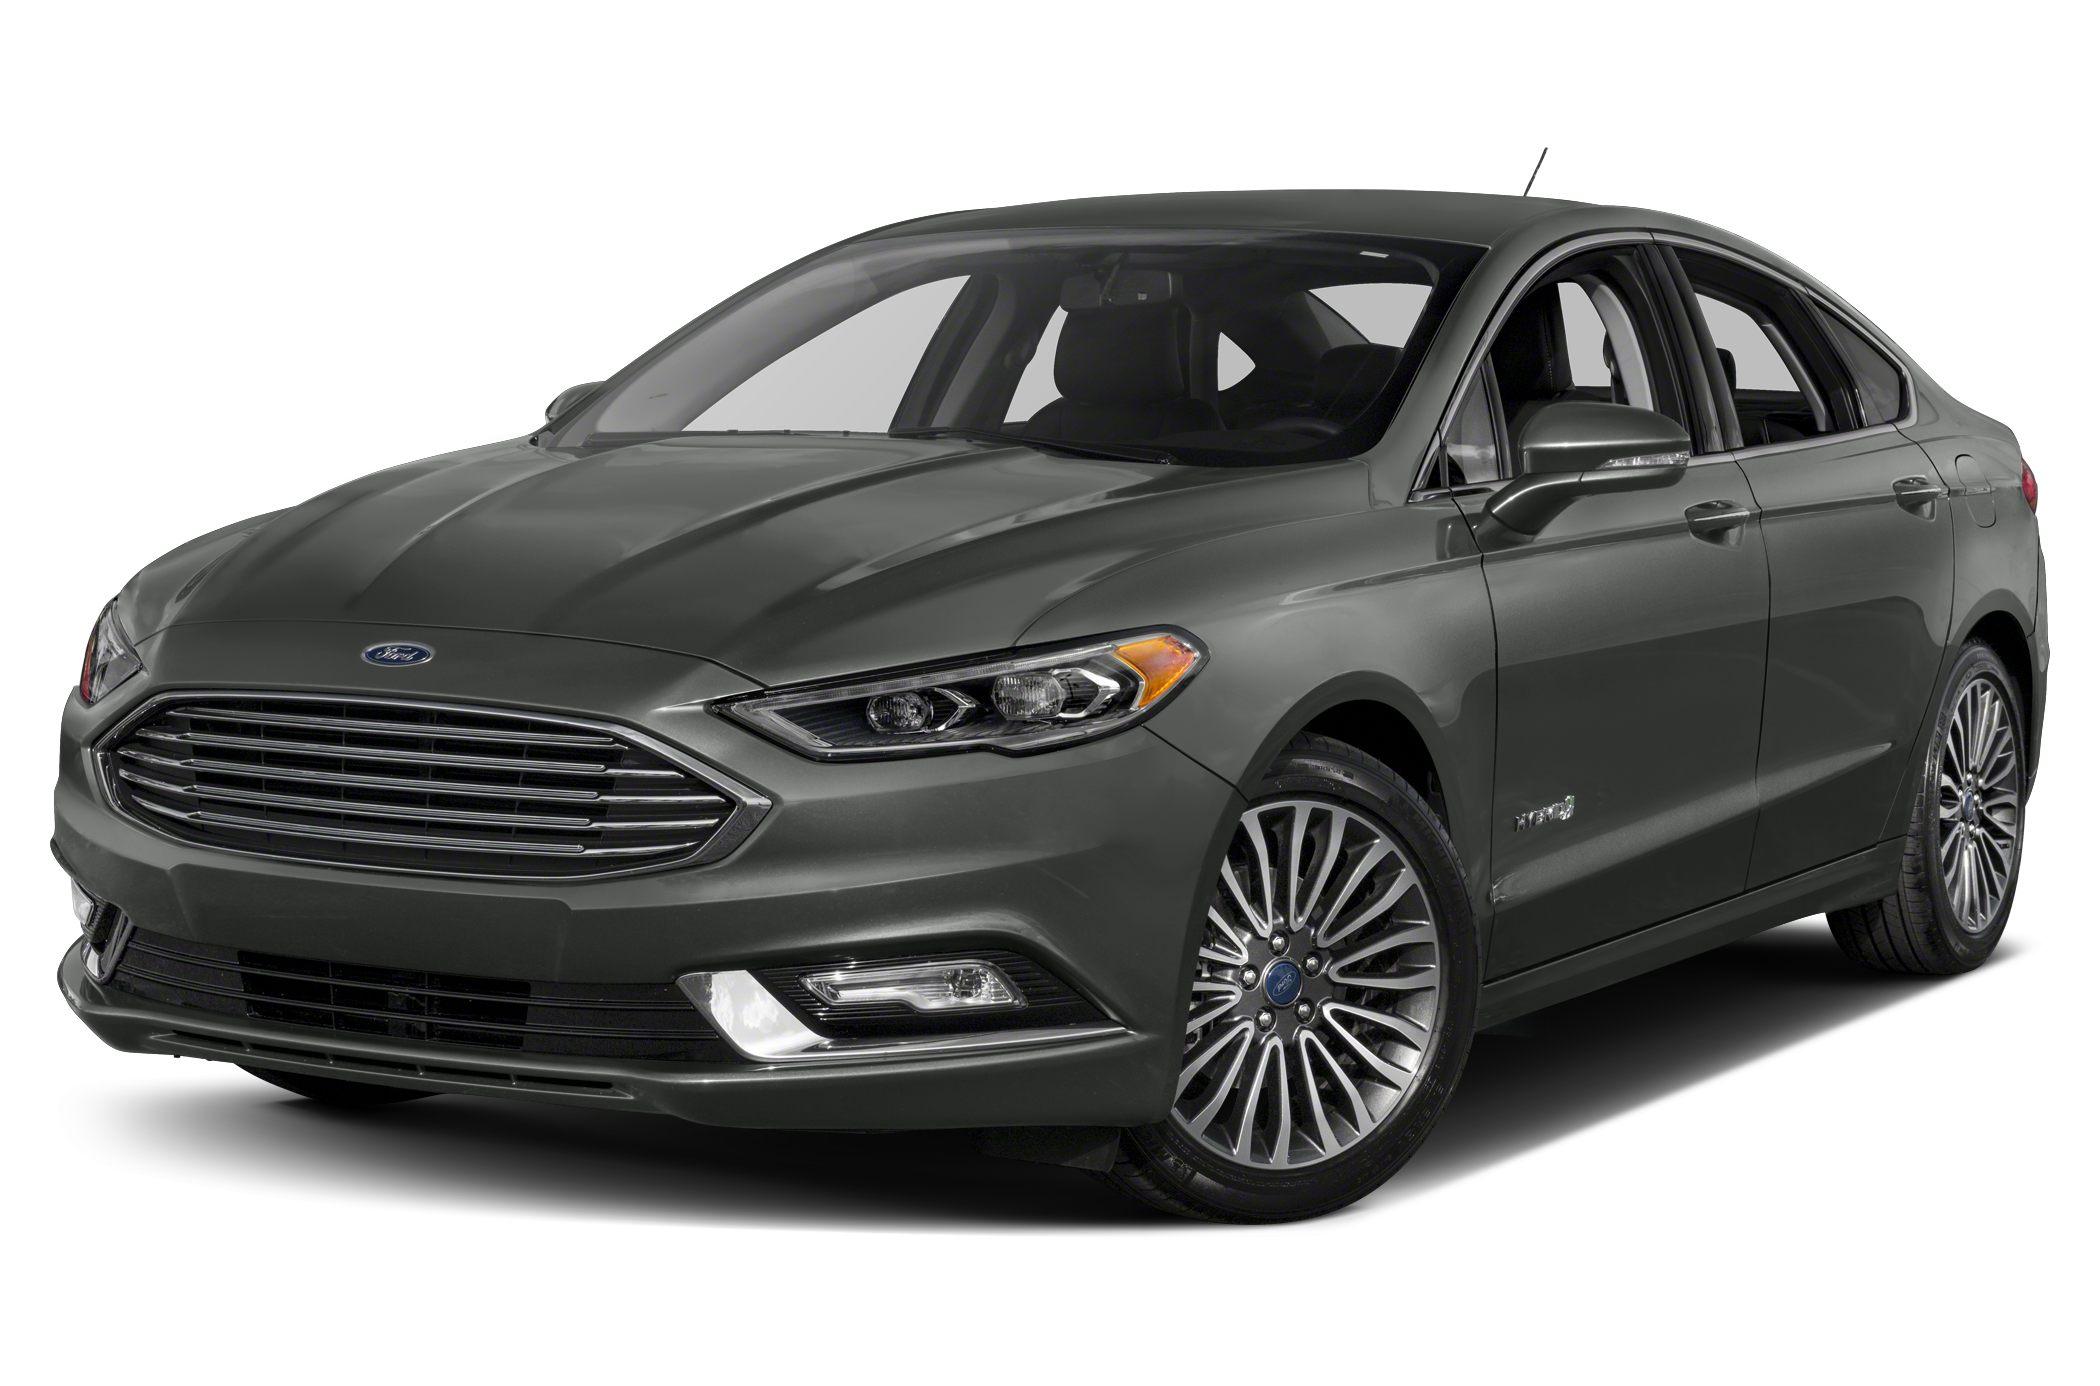 2018 Ford Fusion Hybrid Photos